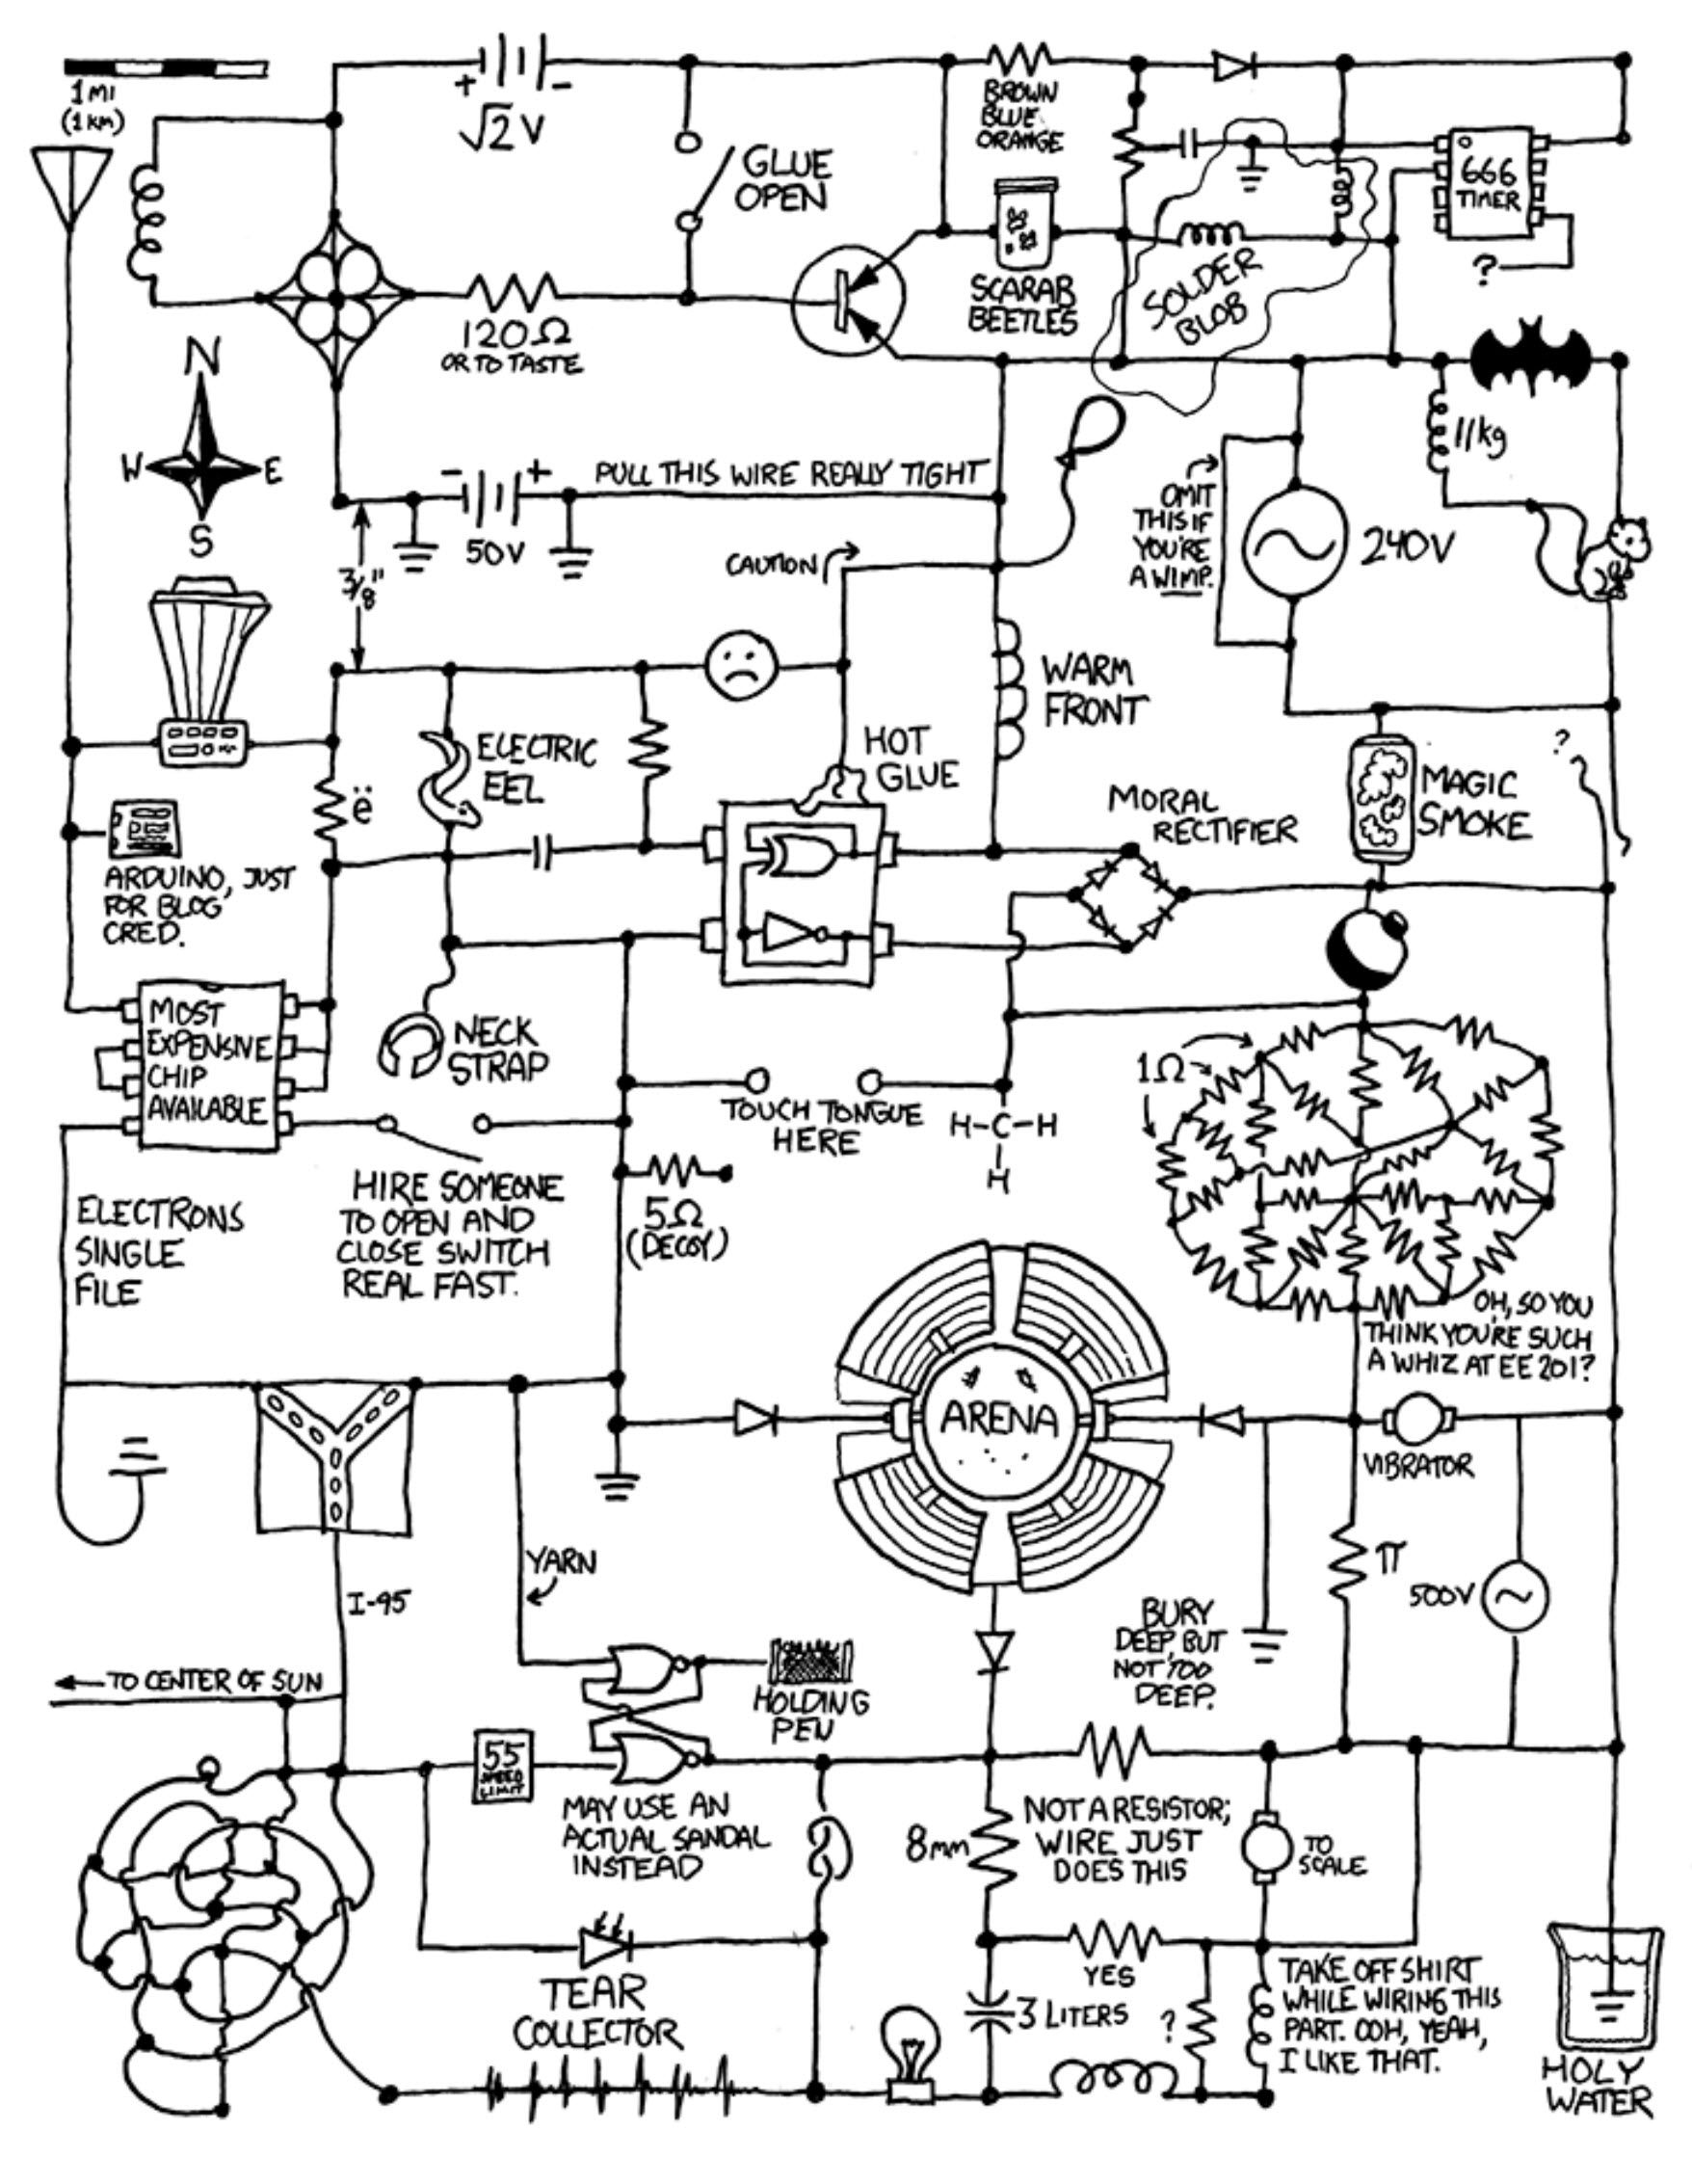 medium resolution of xkcd com circuit diagram lol stuff i like pinterest circuit rh pinterest com 120v electrical switch